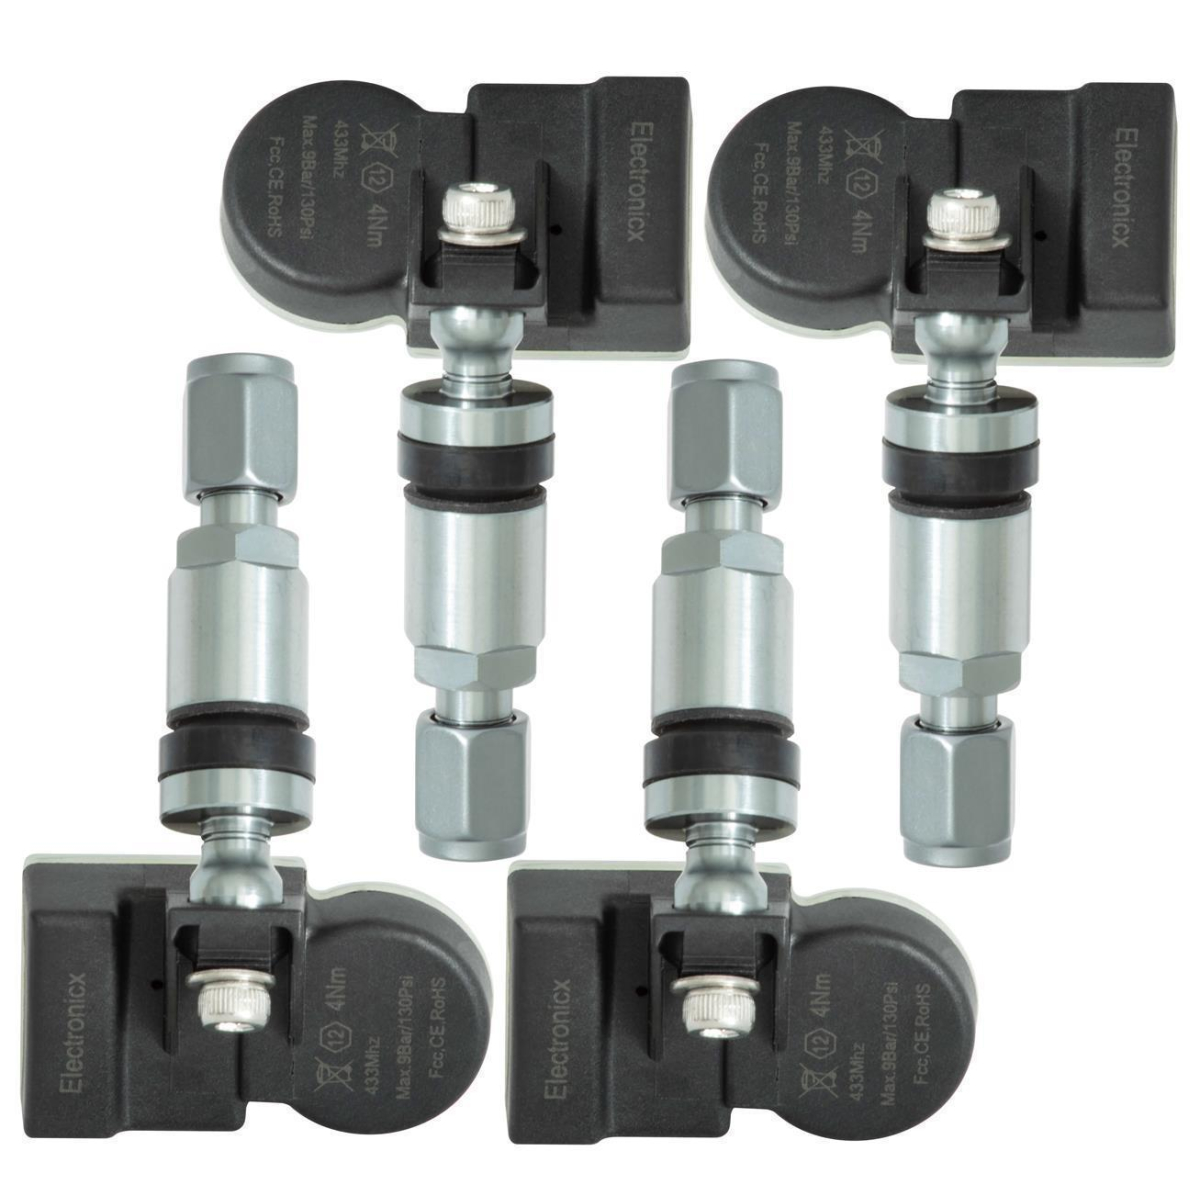 Reifendrucksensoren RDKS Sensoren Metallventil Gunmetal für JMC QiLing T7